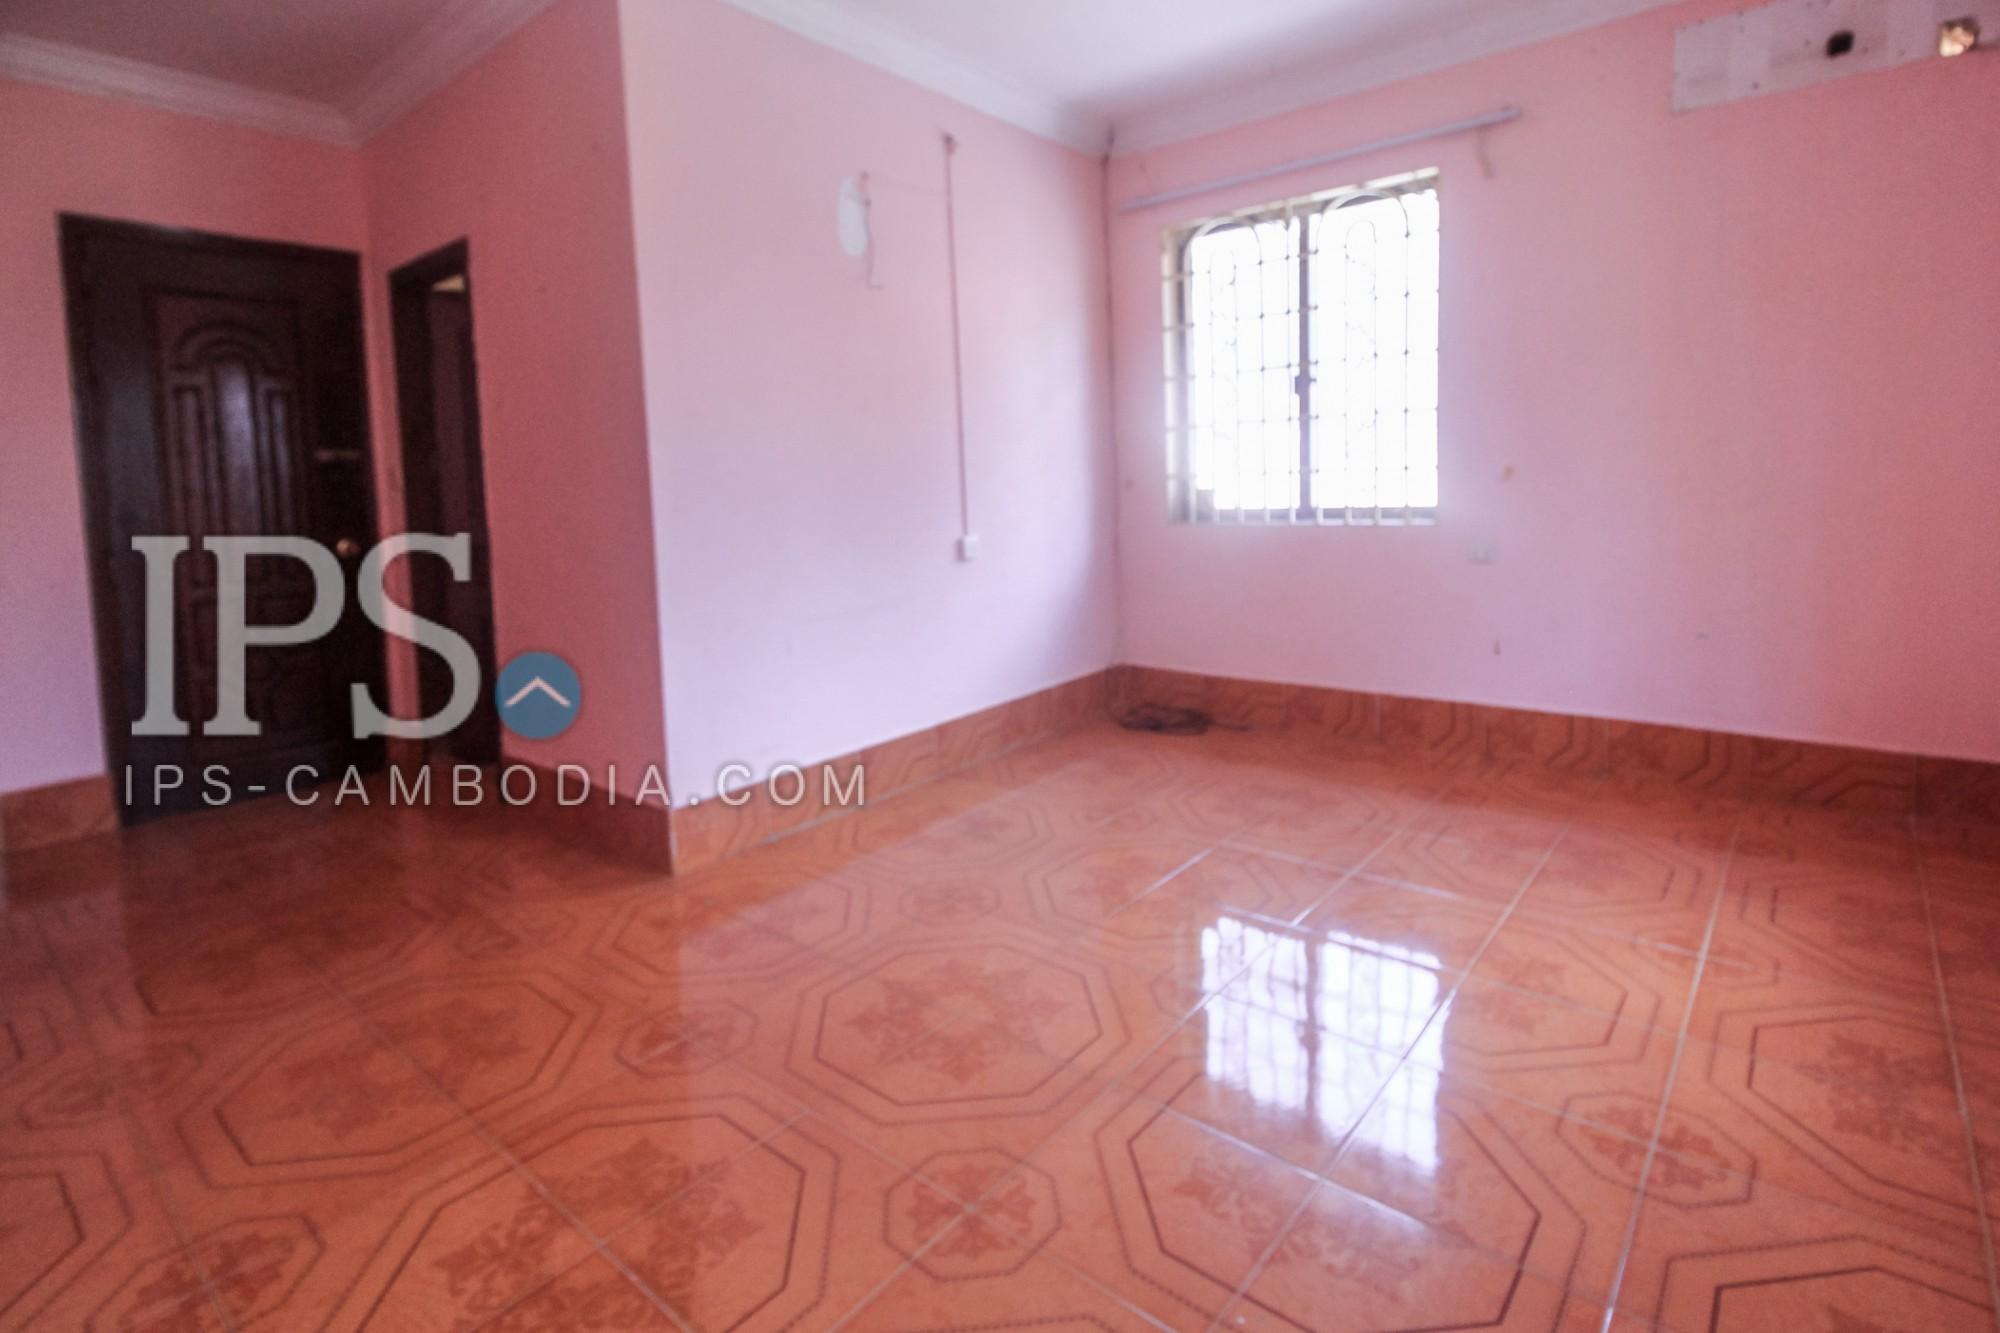 8 Bedroom Villa for Rent - Siem Reap